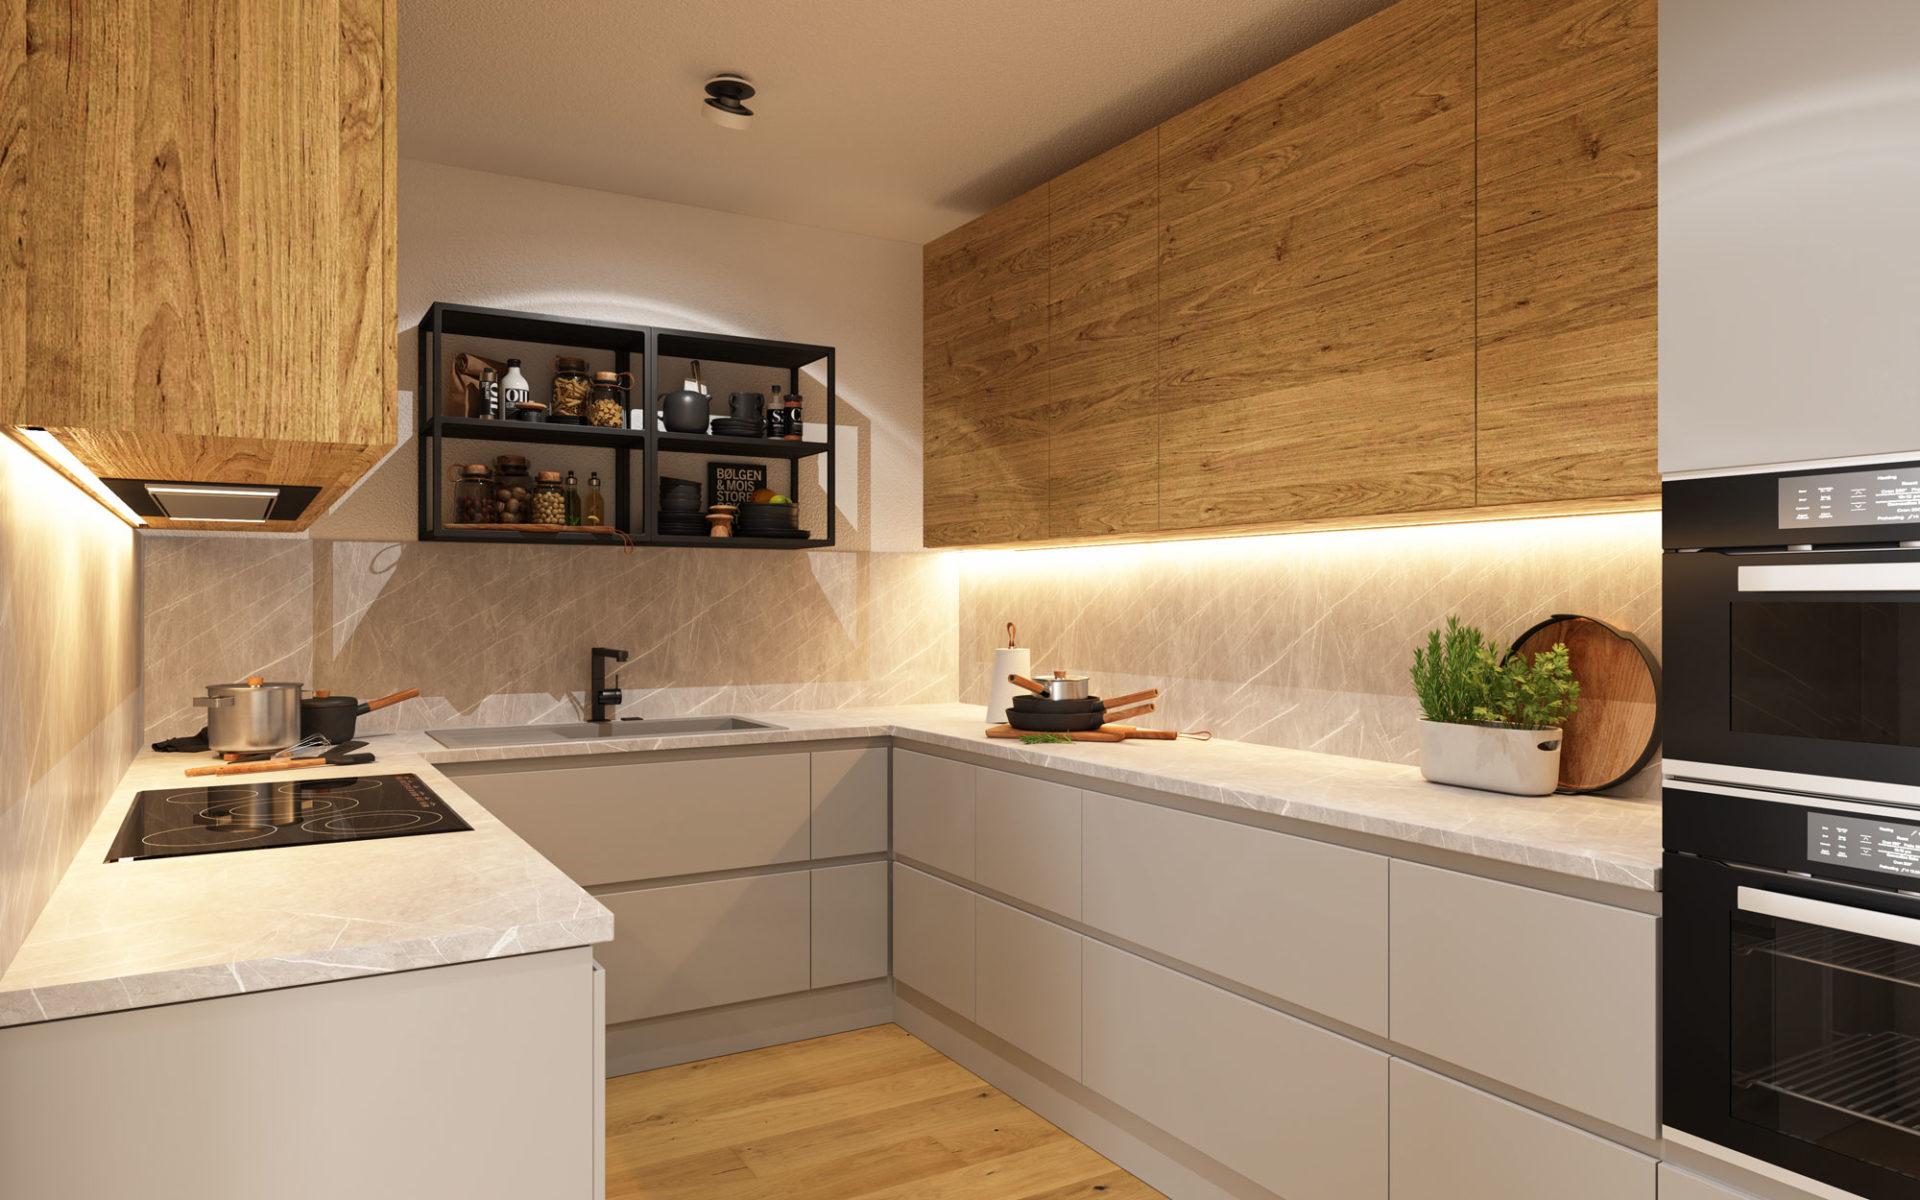 Küche 3D Visualisierung Innenraum